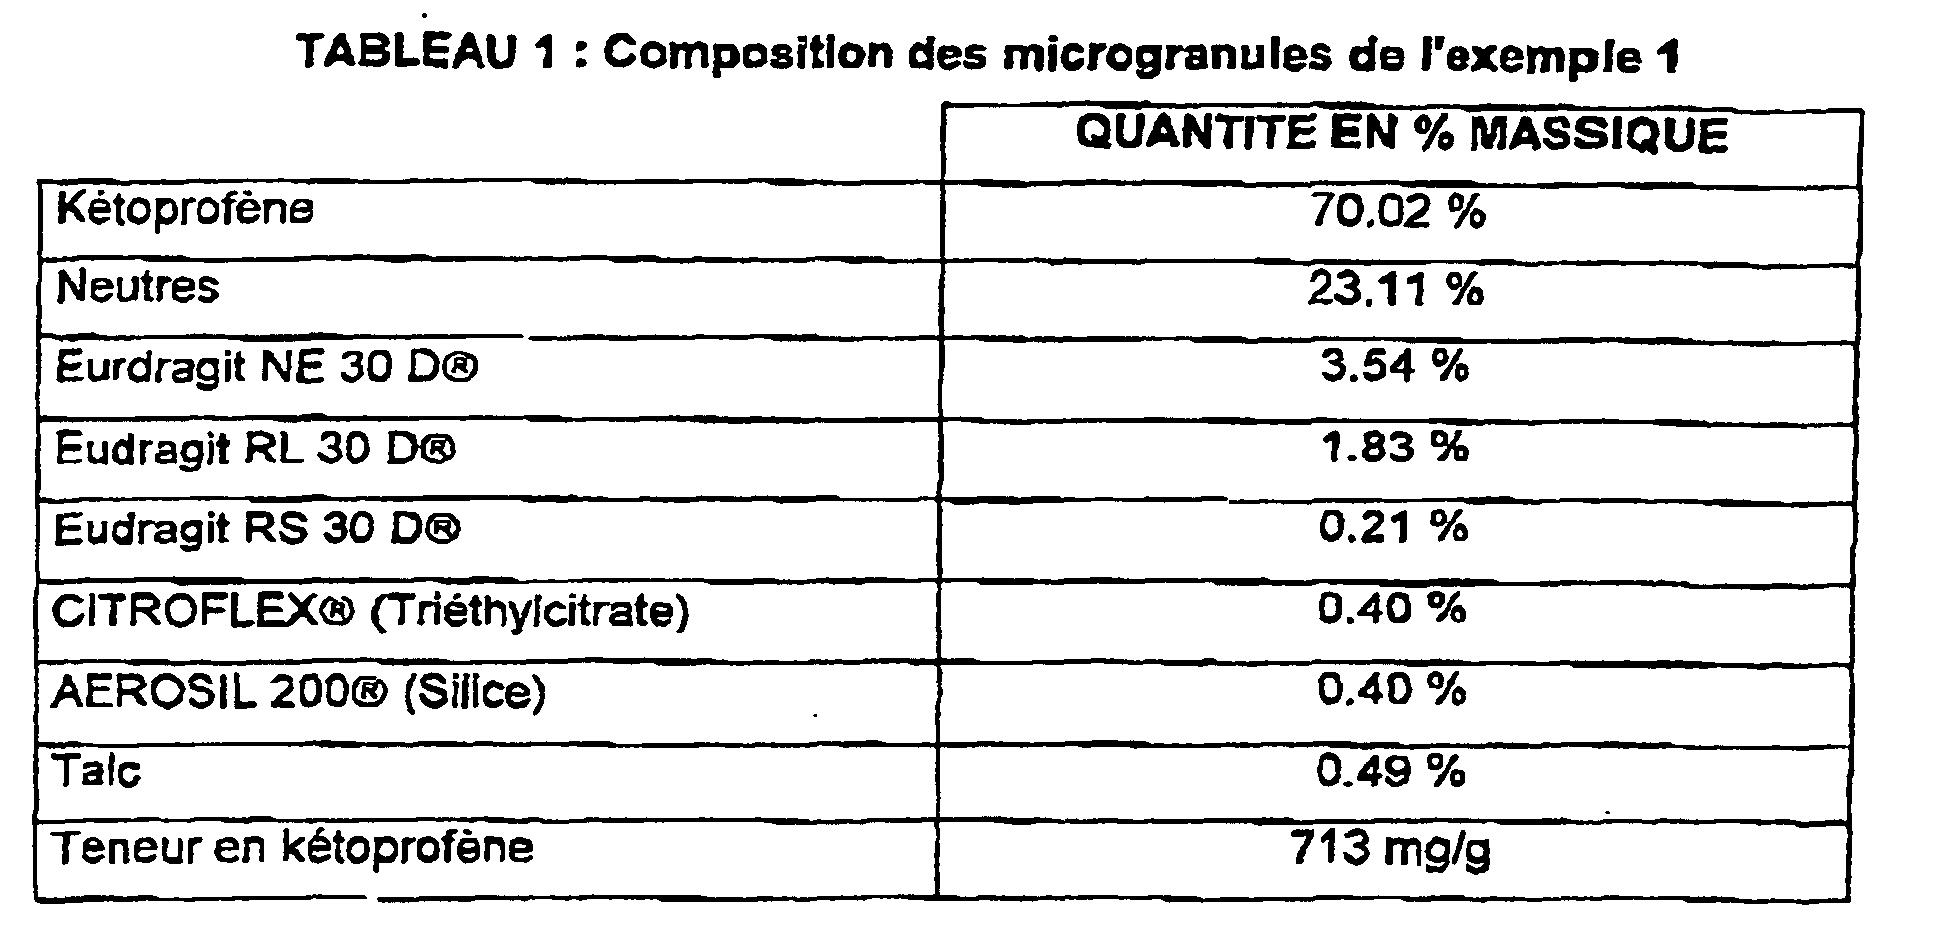 MICROGRANULES DE KETOPROFENE, LEUR PROCEDE DE PREPARATION ET